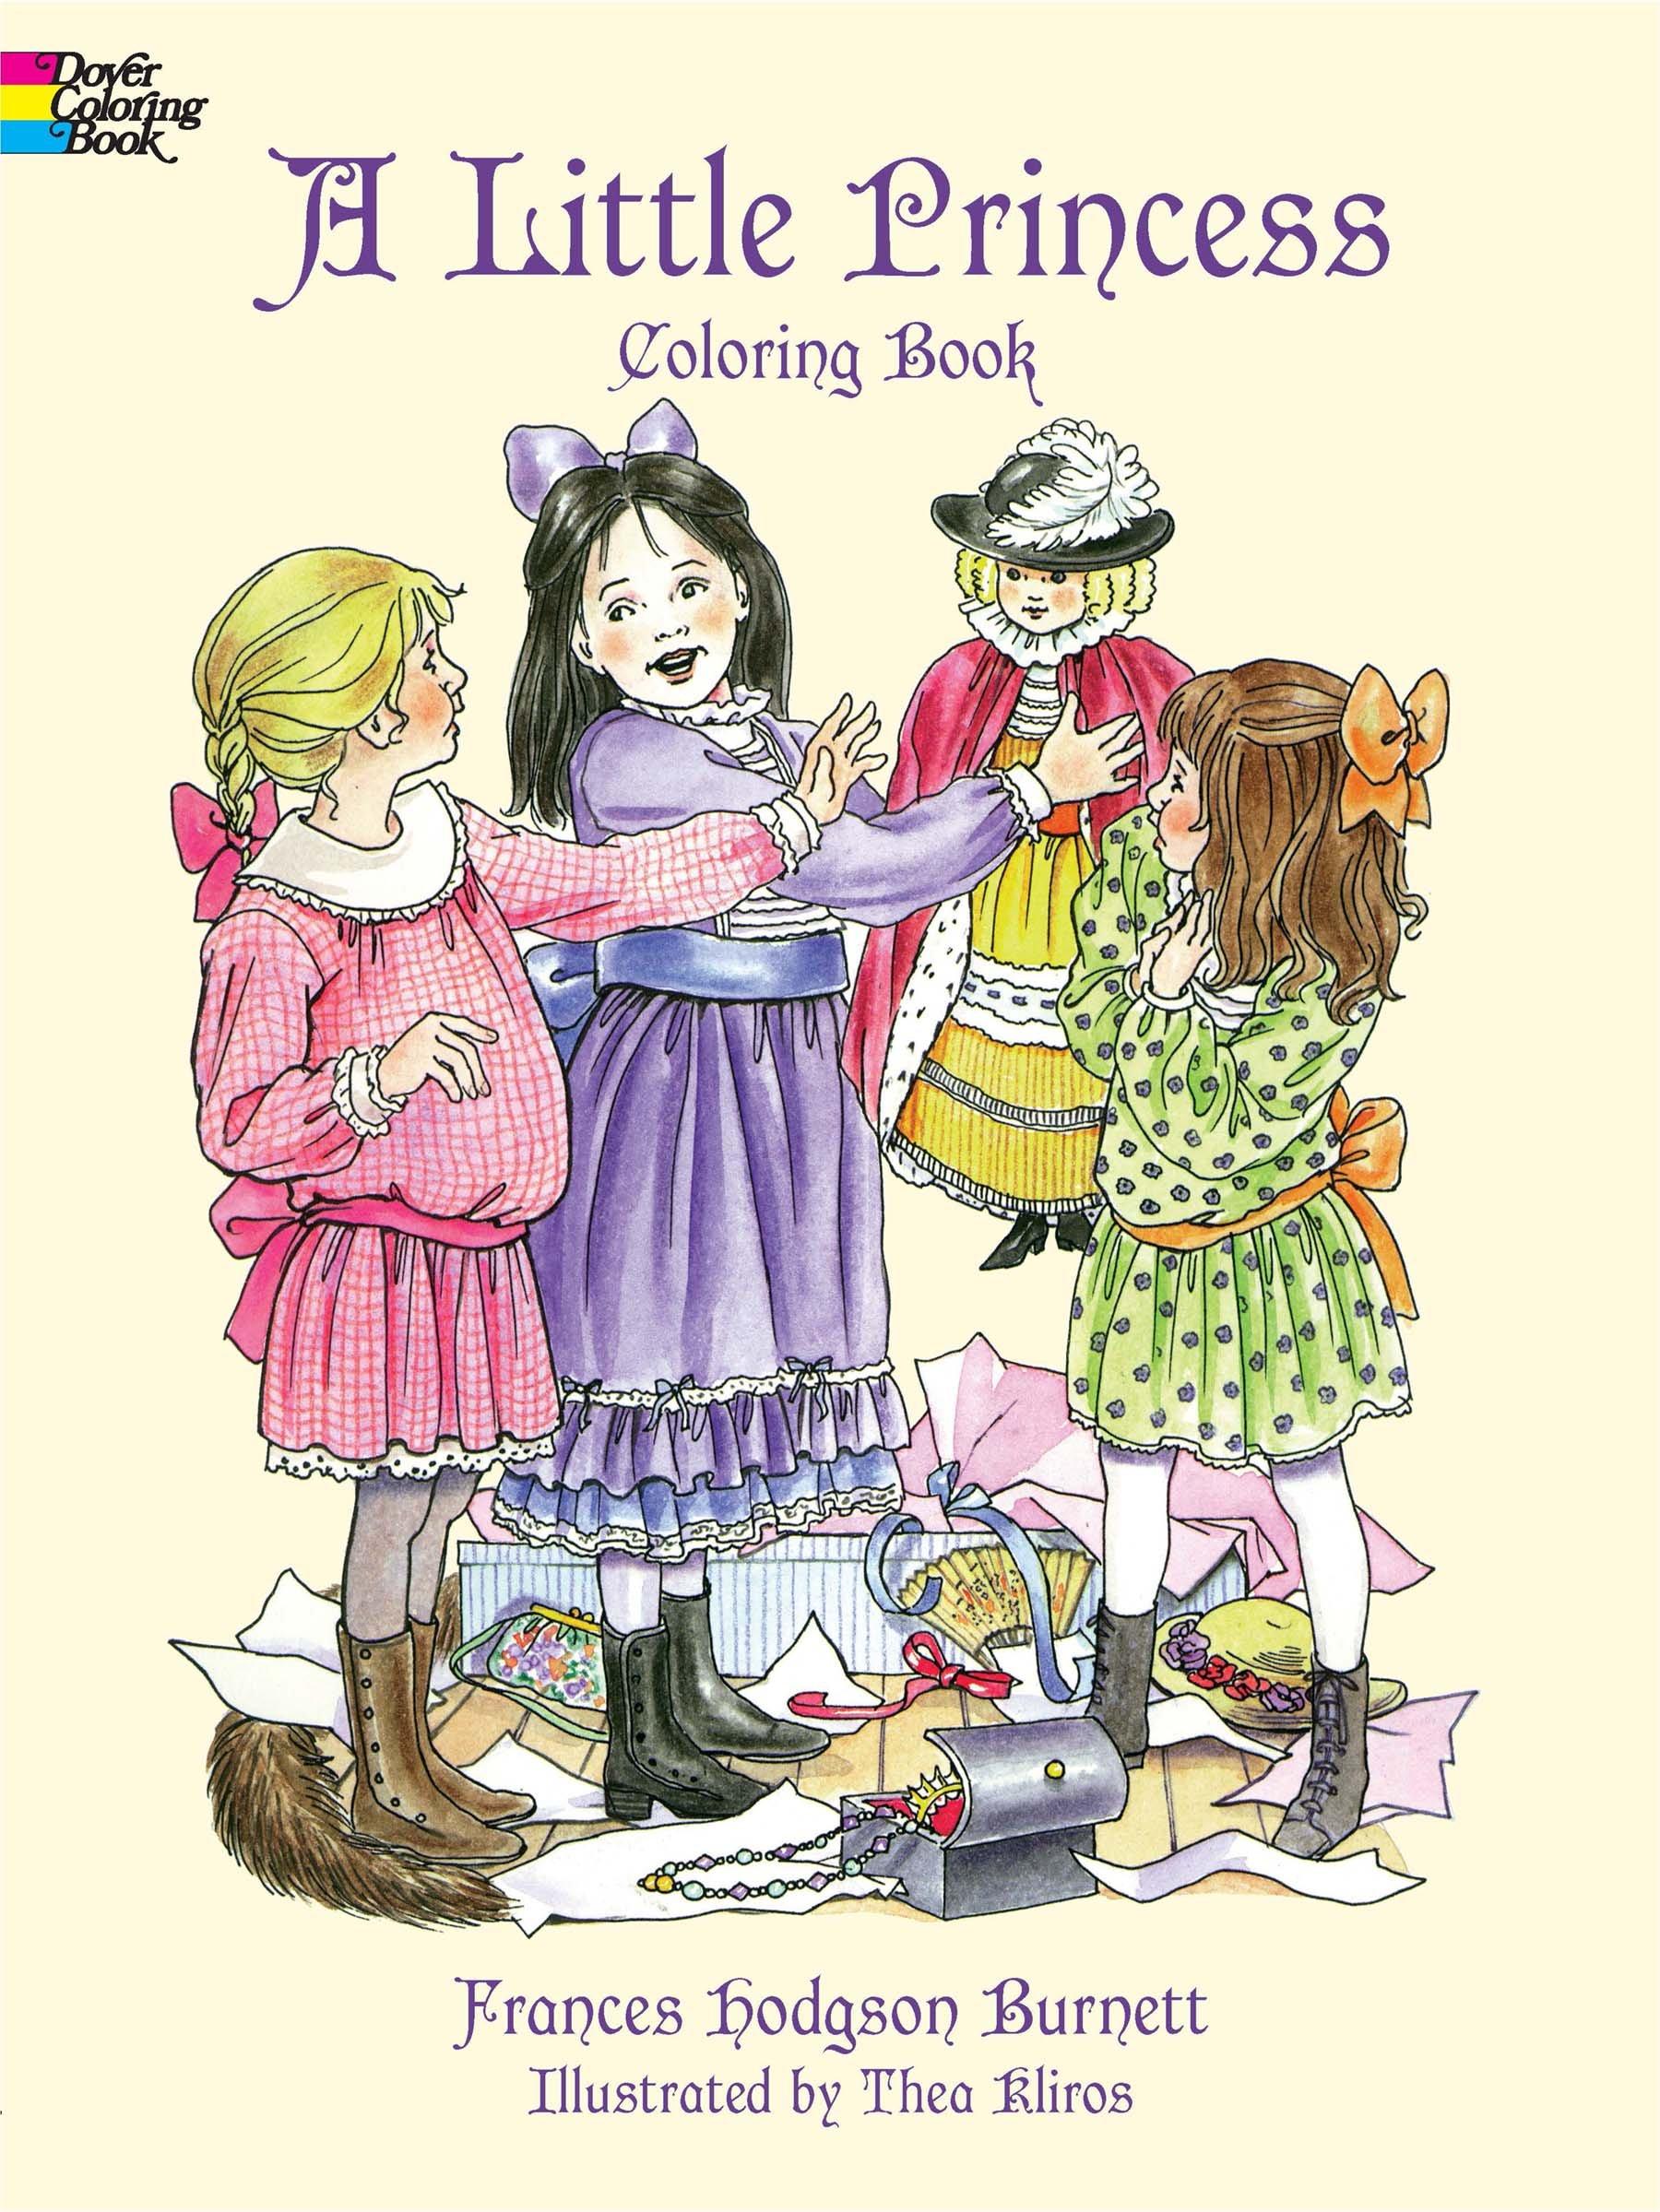 A Little Princess Coloring Book (Dover Coloring Books) ebook